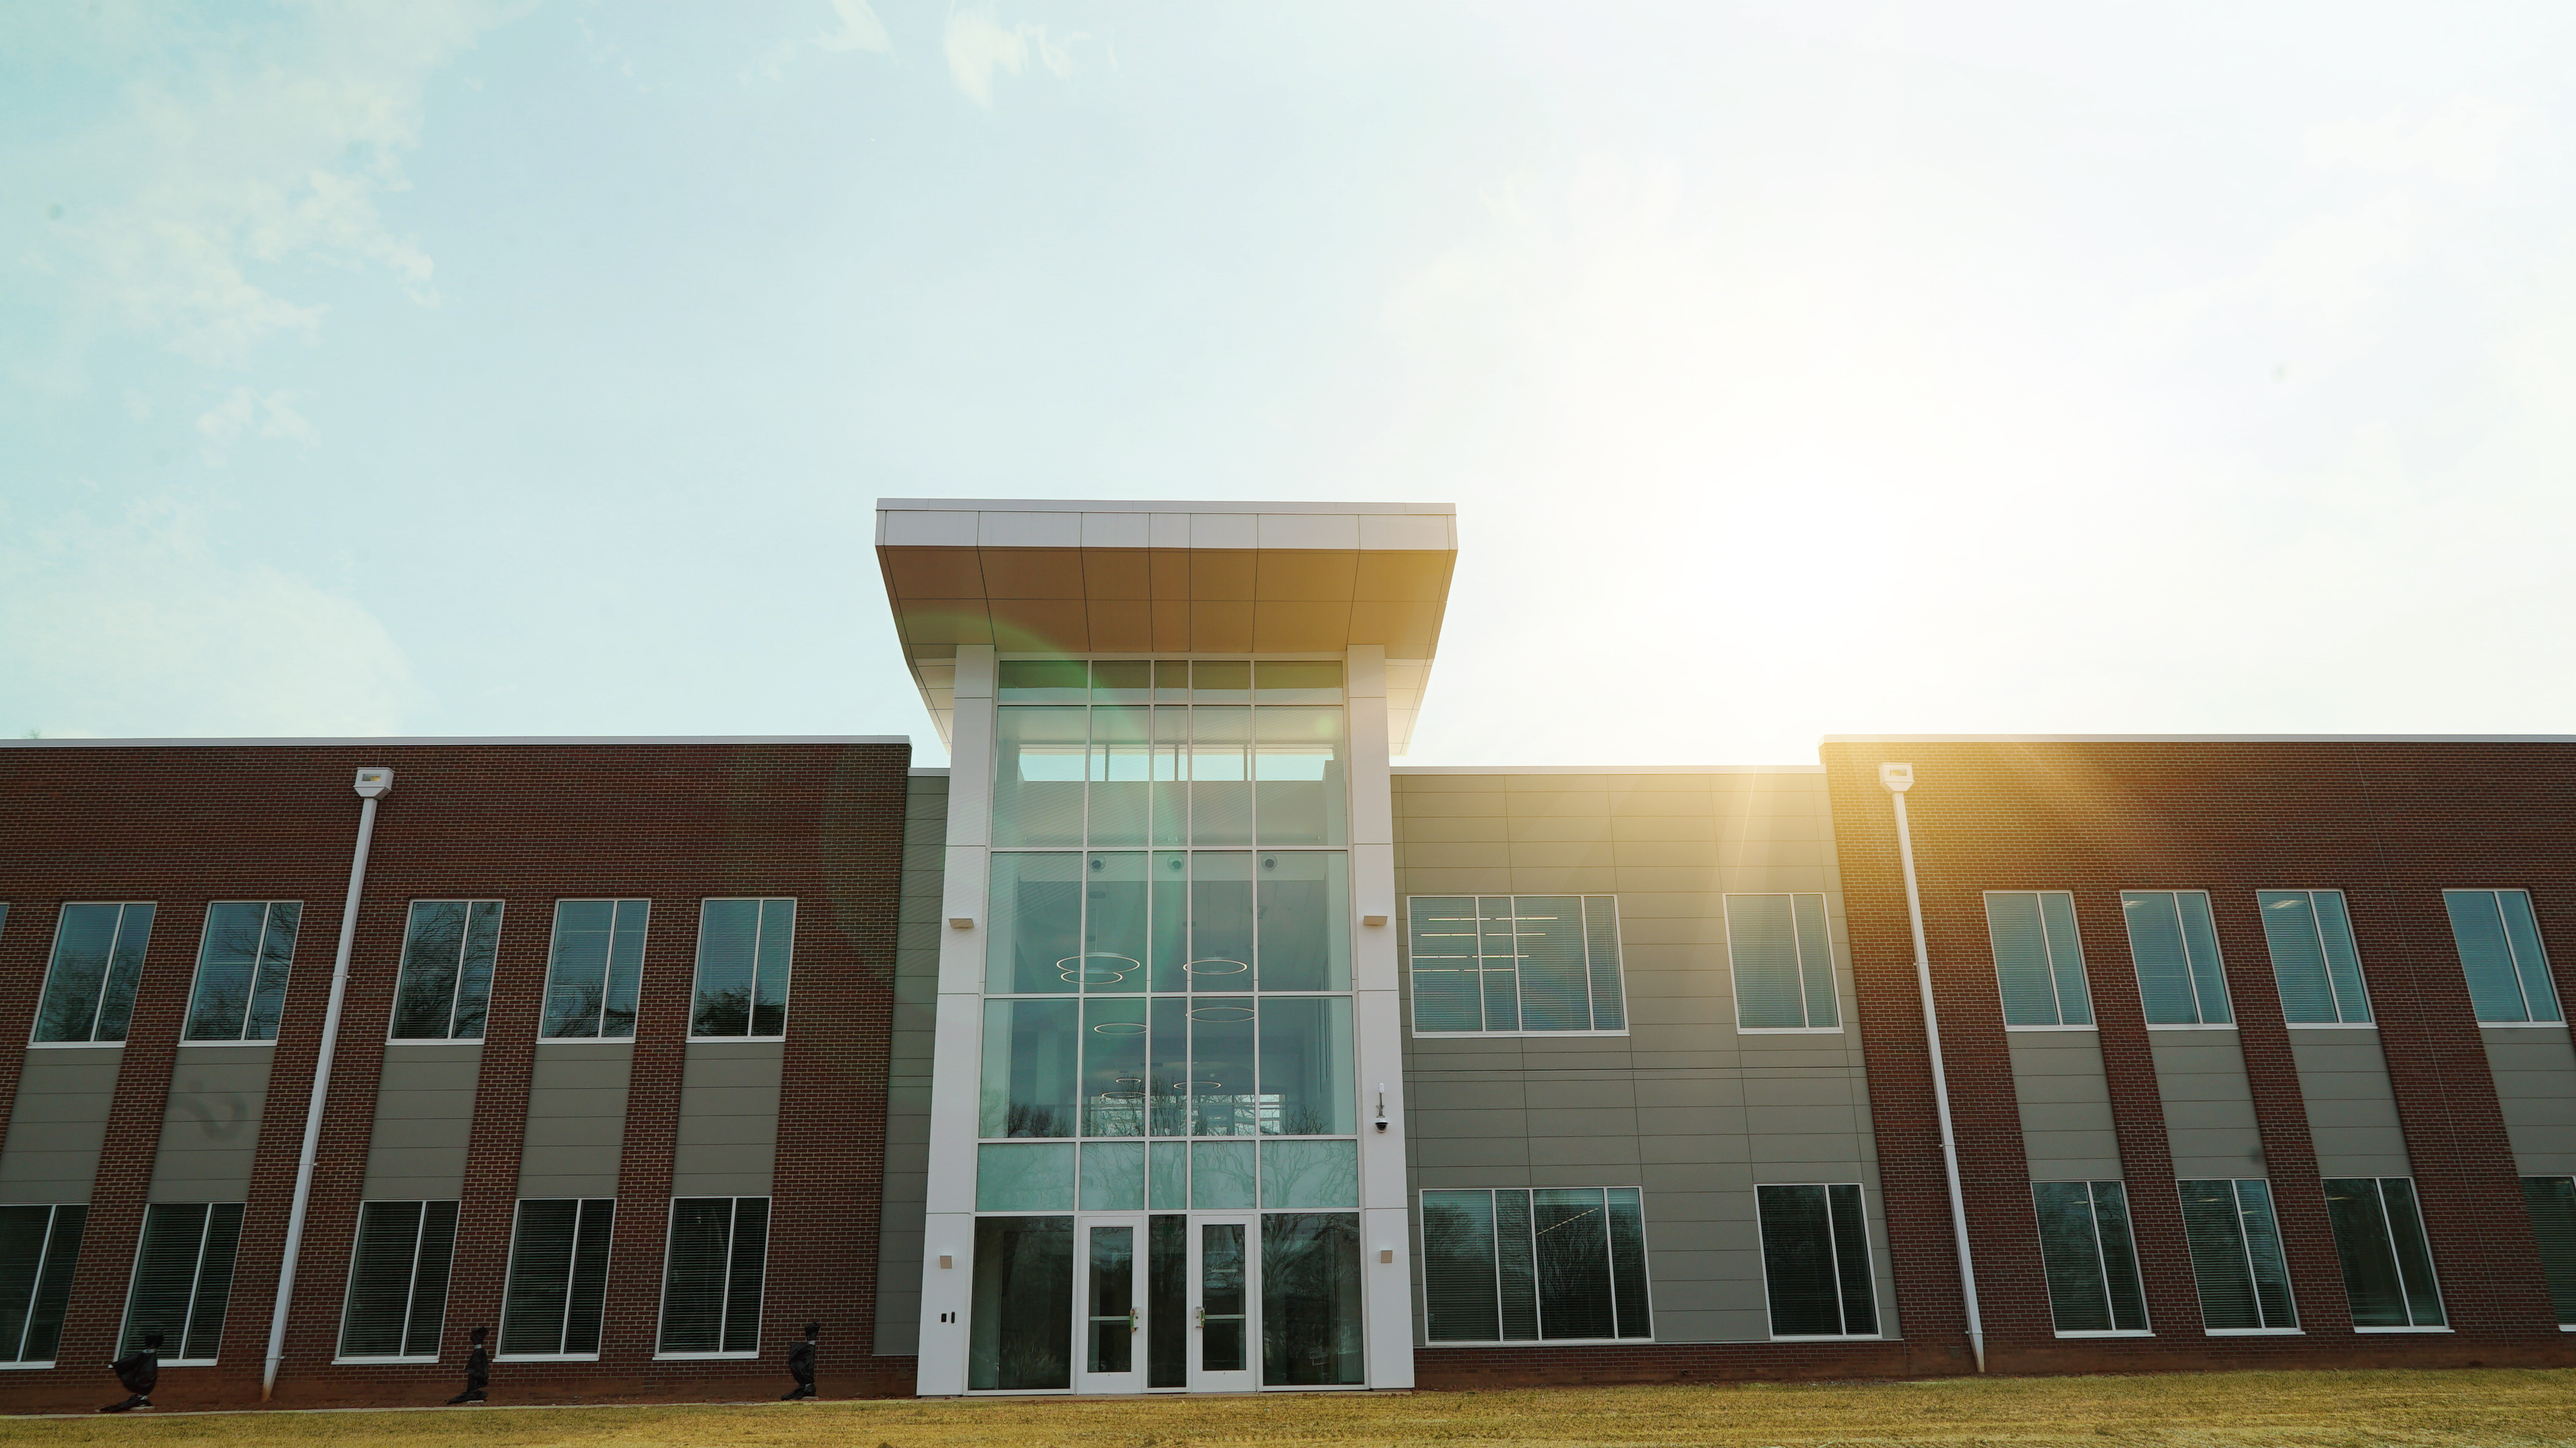 Mitchell's Health Sciences Building, home of the Associate Degree Nursing program